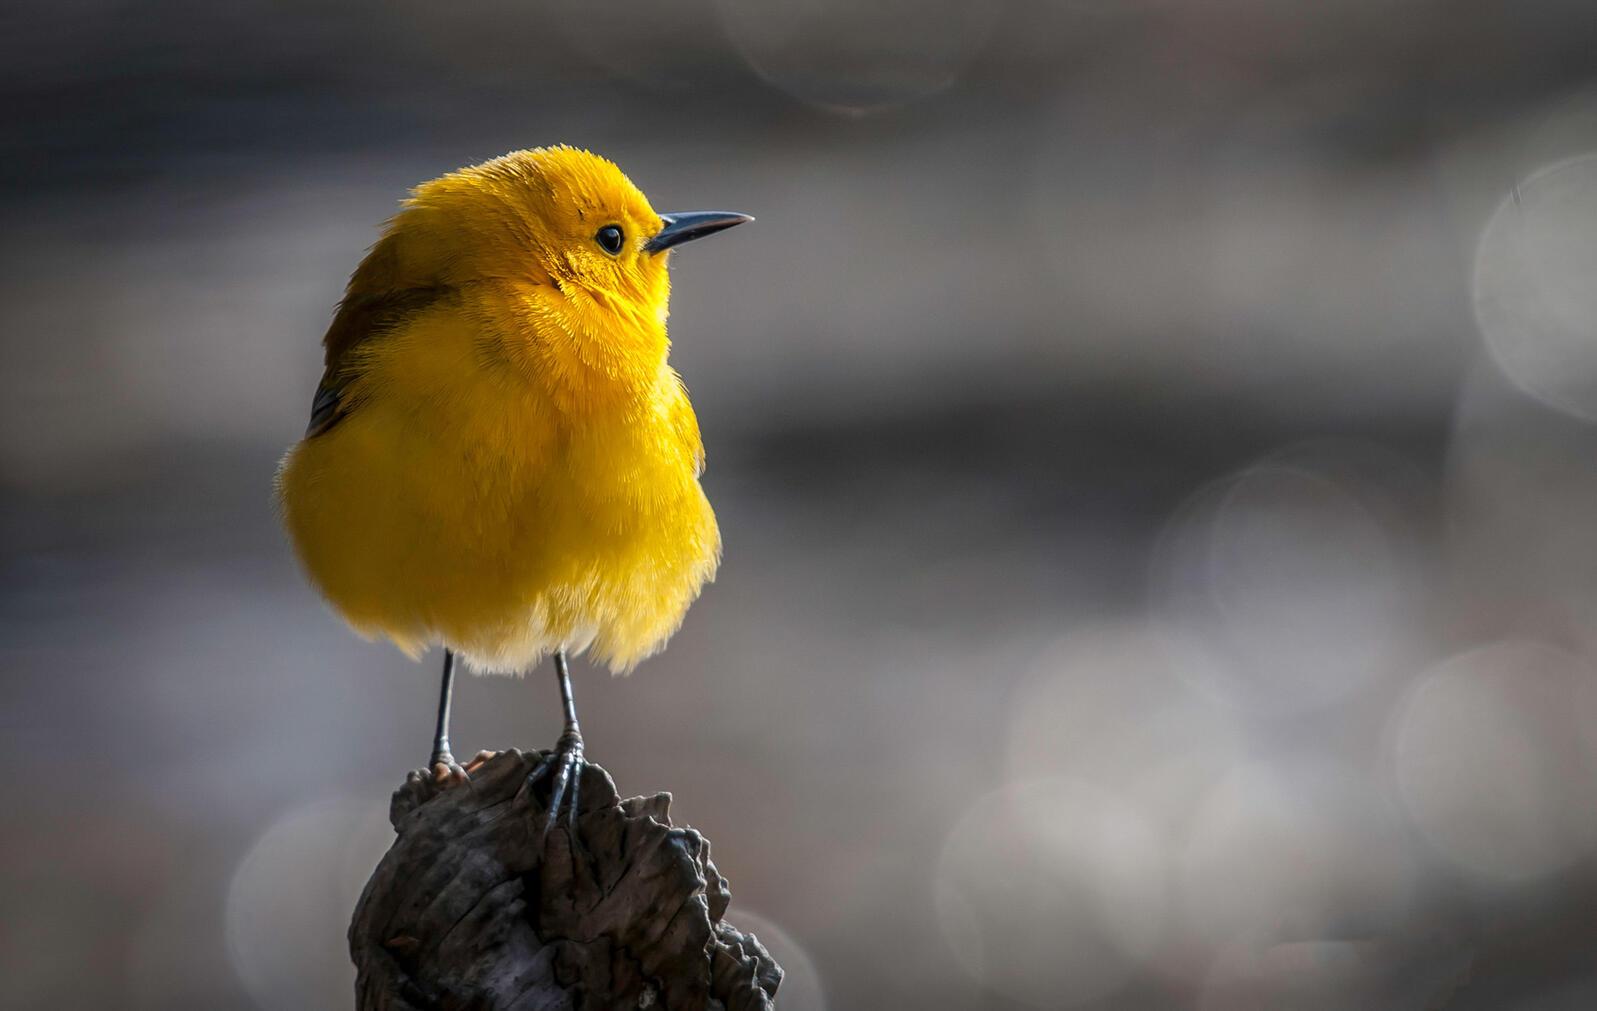 Prothonotary Warbler. Tom Reichert/Audubon Photography Awards